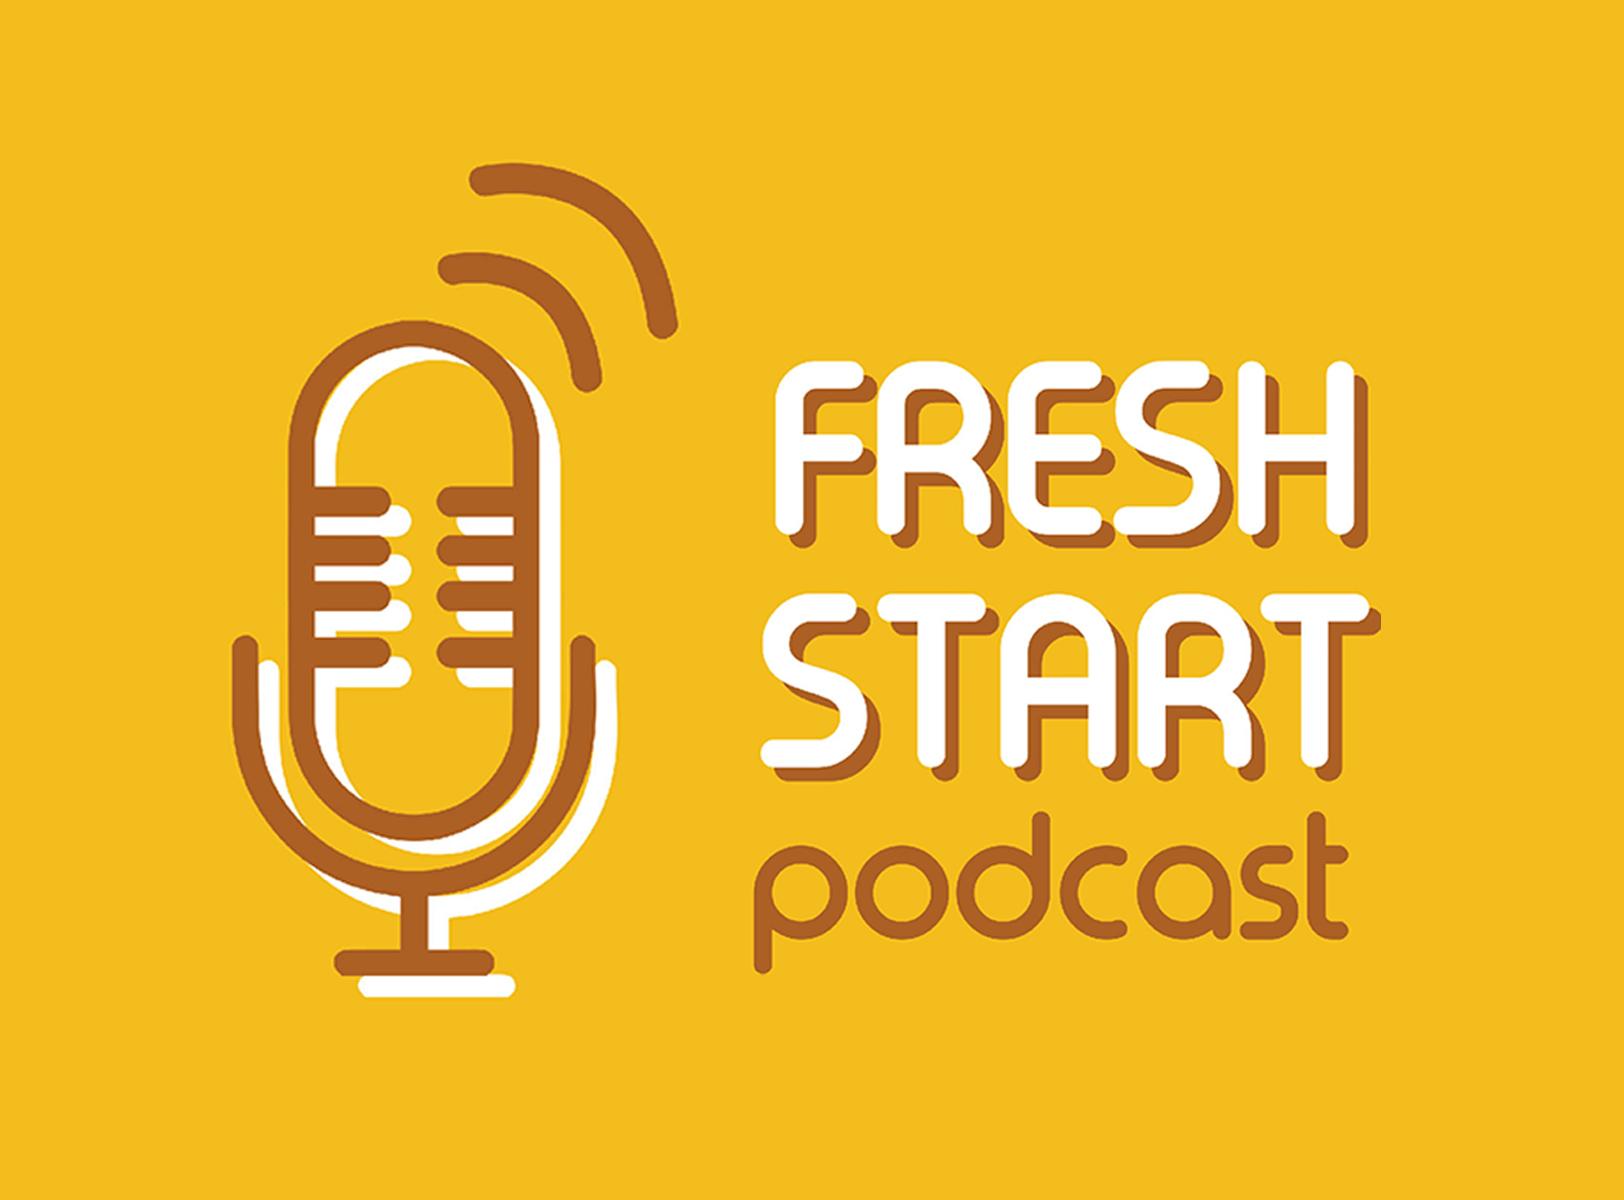 Fresh Start: Podcast News (4/30/2019 Tue.)